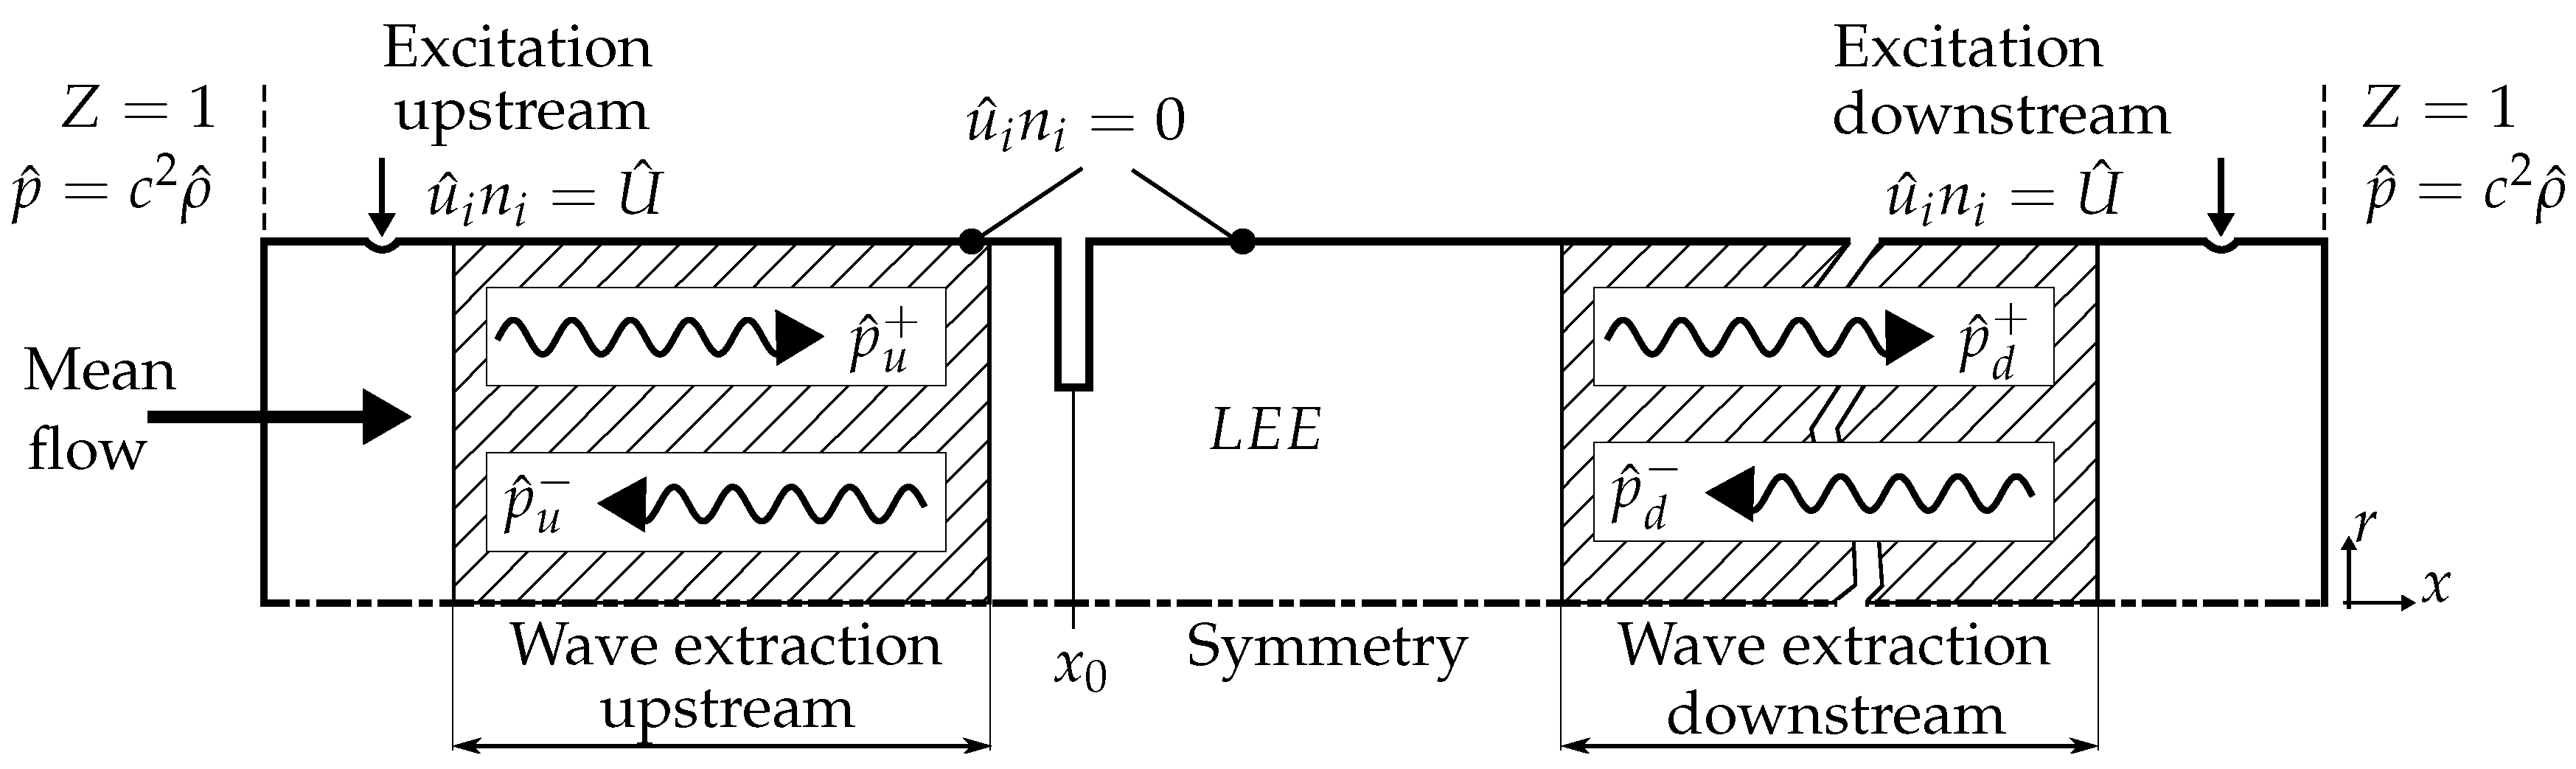 Aerospace Engineering Equations